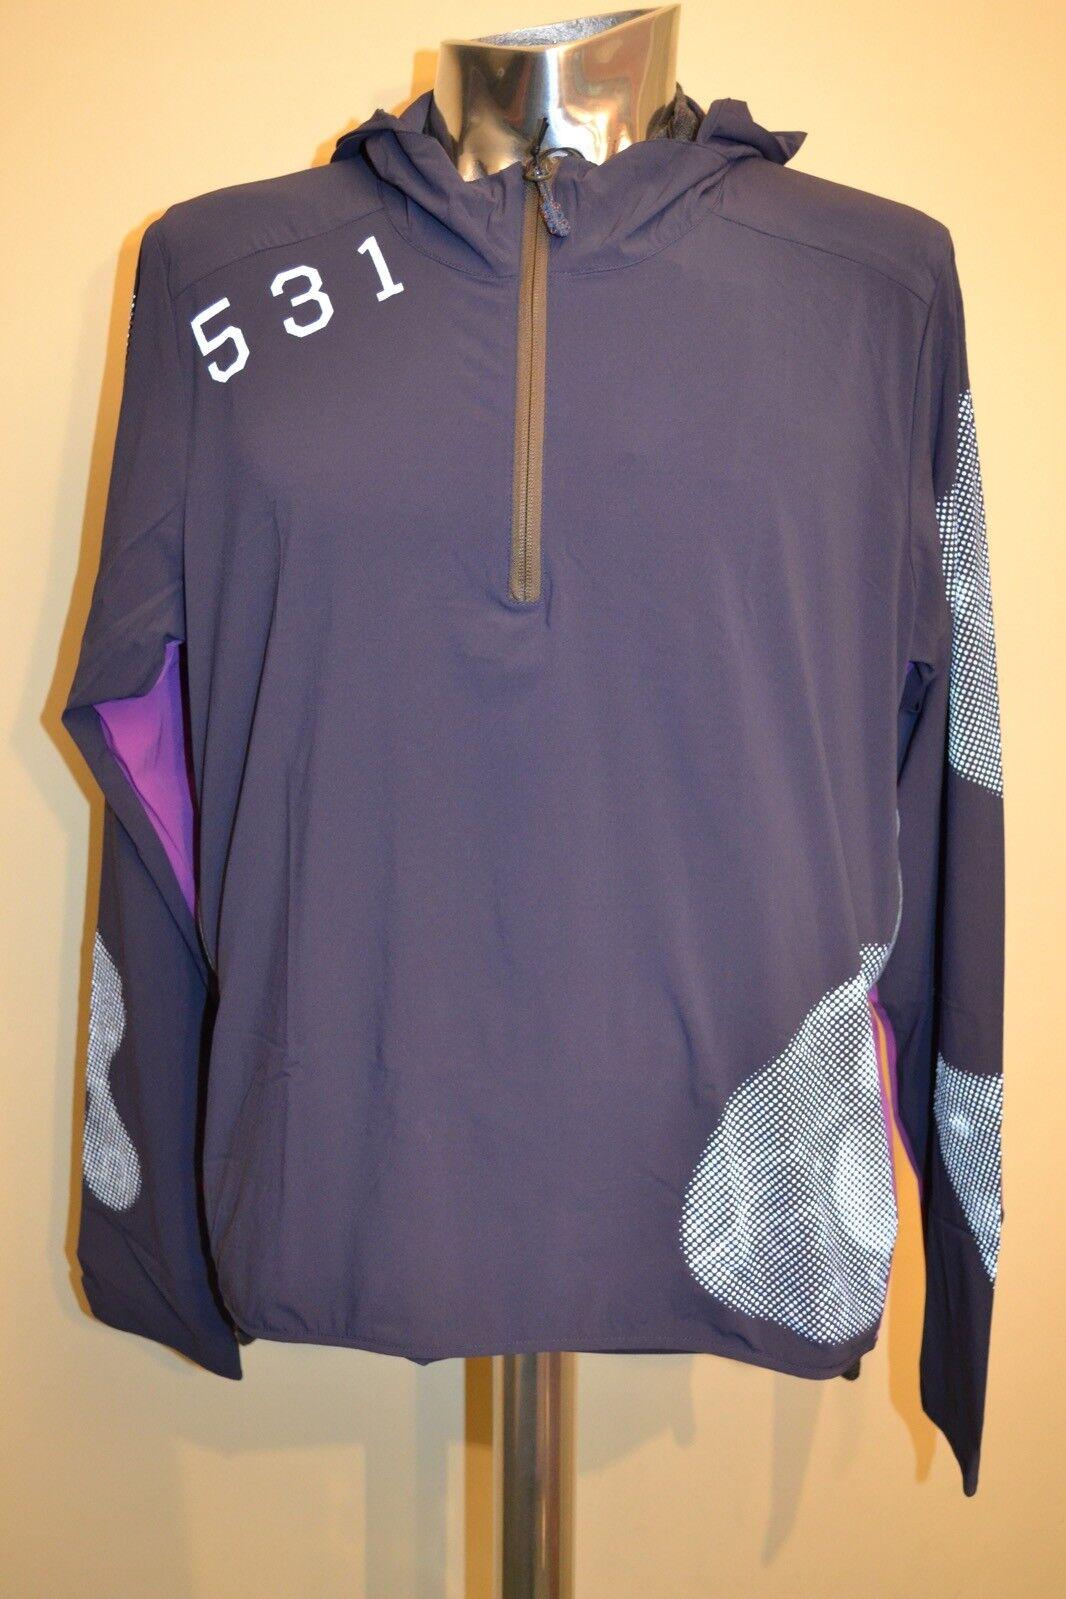 Paul Smith 531 Blau Regenfest Radsport Kapuzenpullover GRÖSSE S S S NEU b91c87